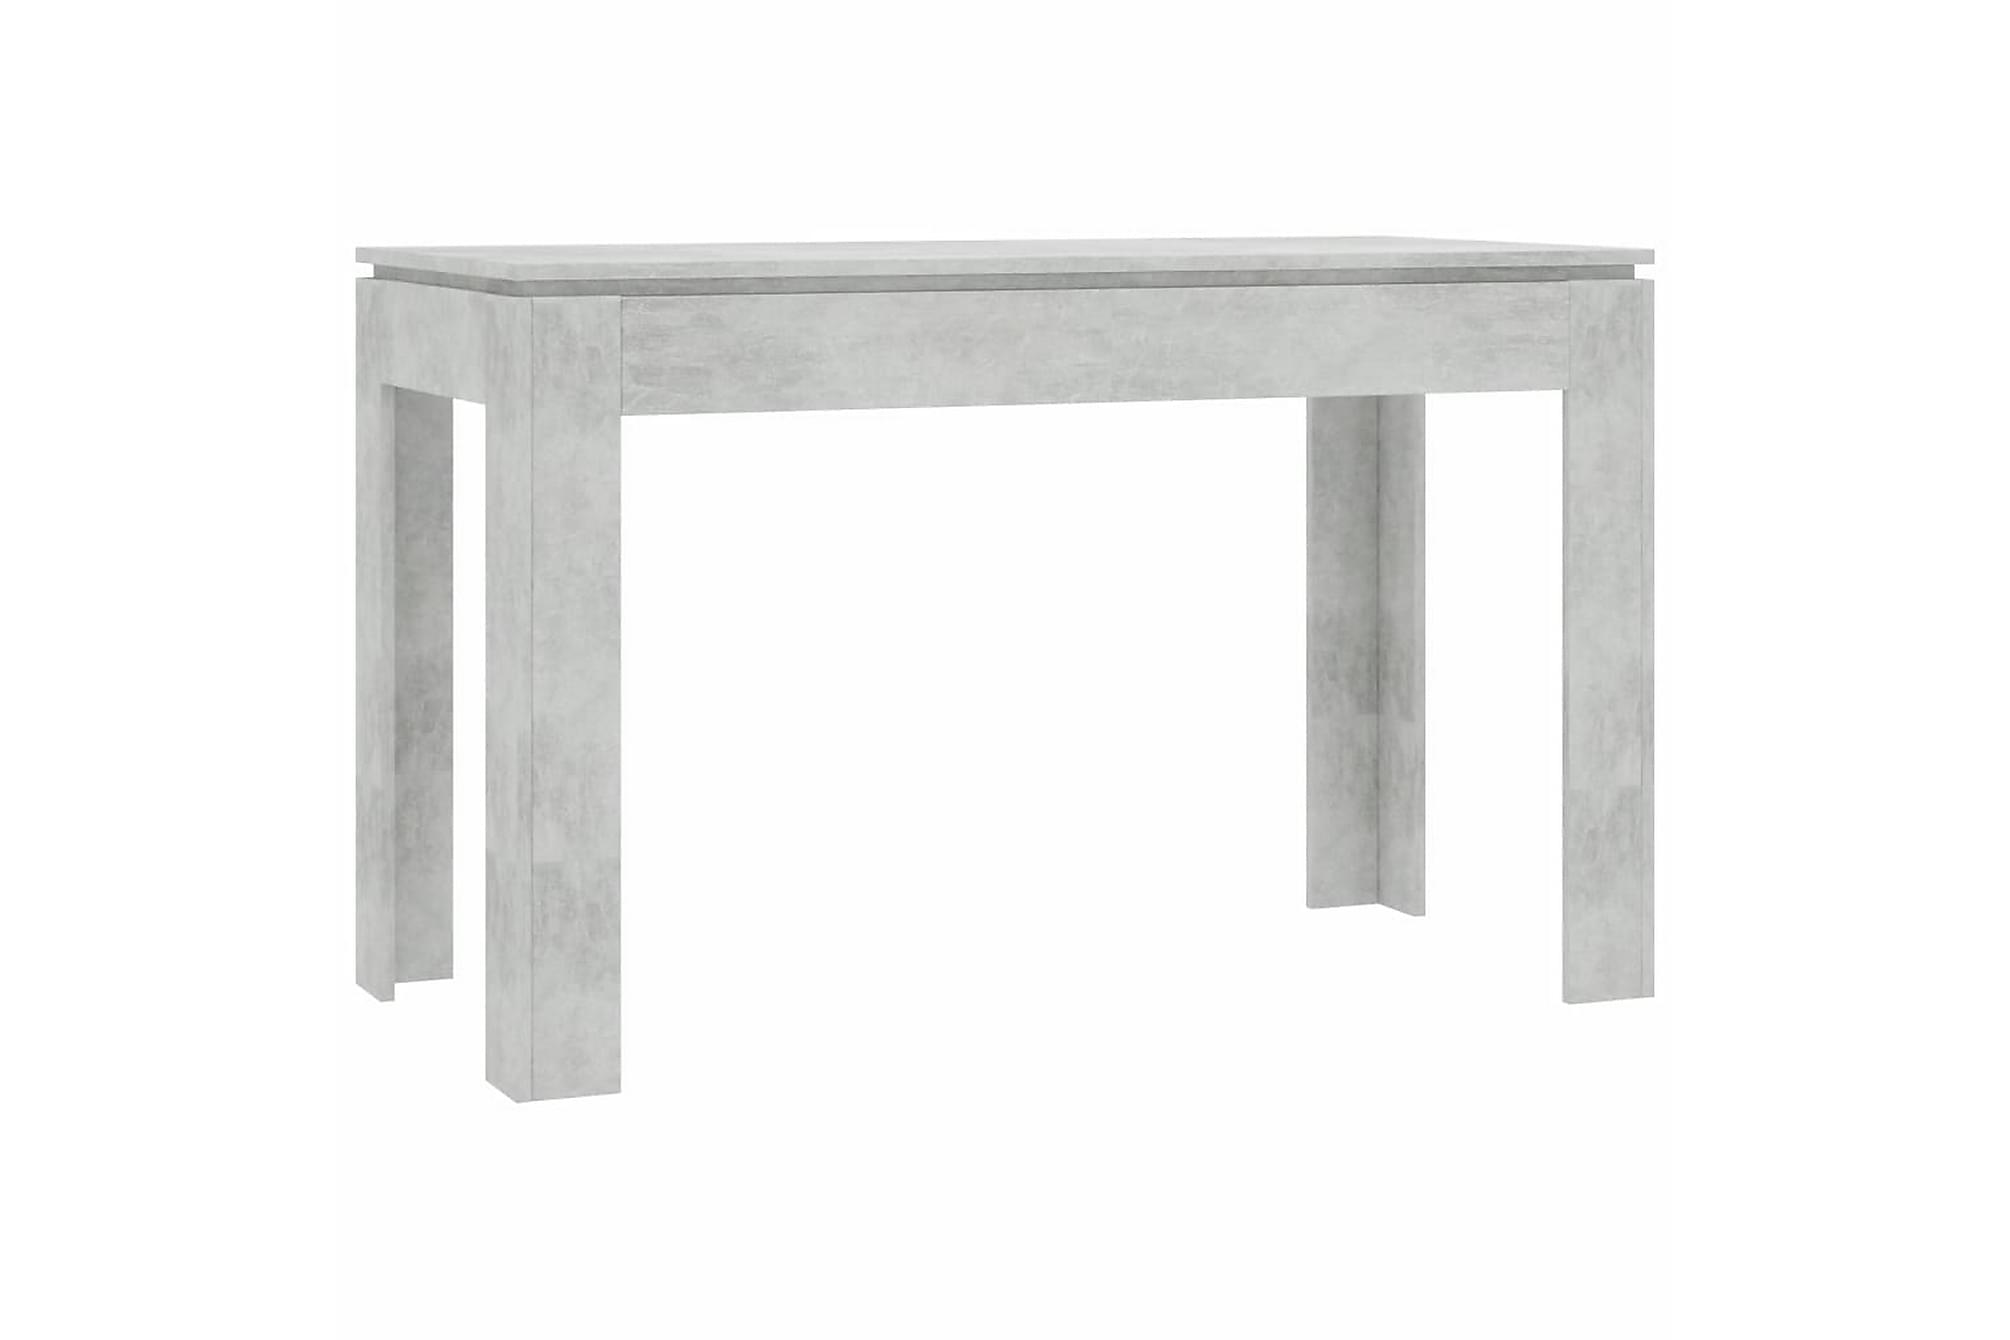 Matbord betonggrå 120x60x76 cm spånskiva